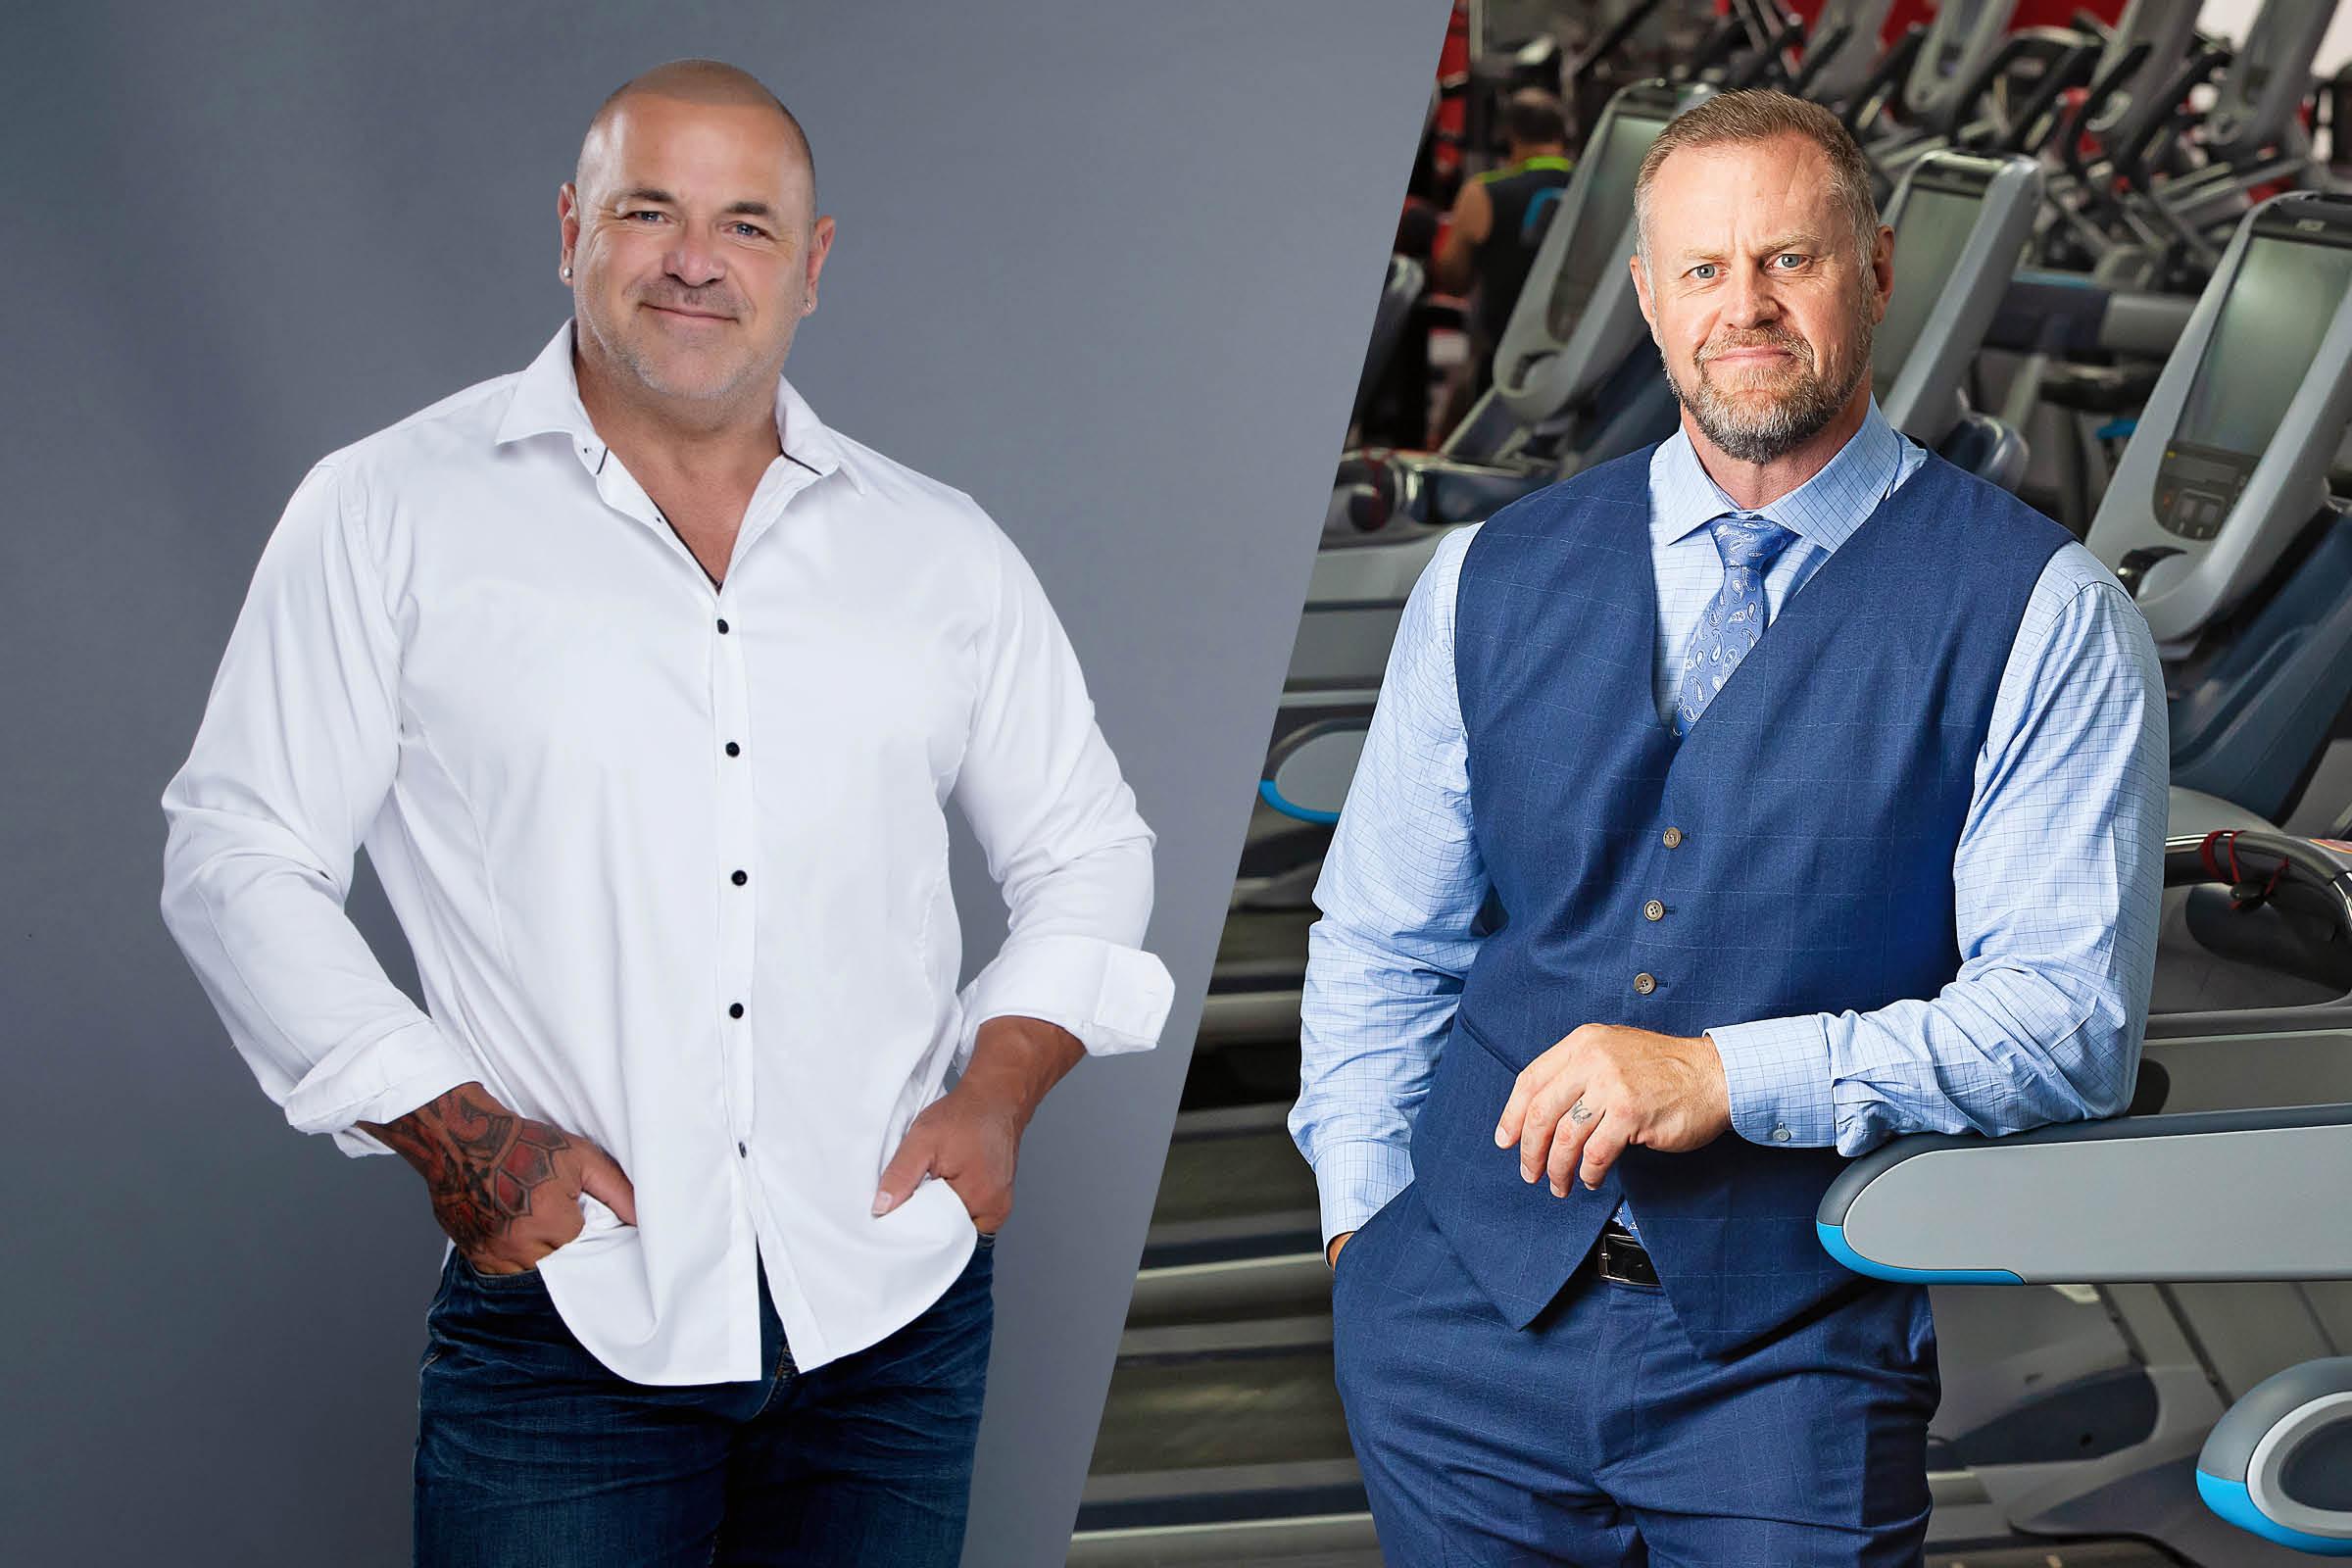 Jon Davie and Mike Nysten, Directors of World Gym Australia